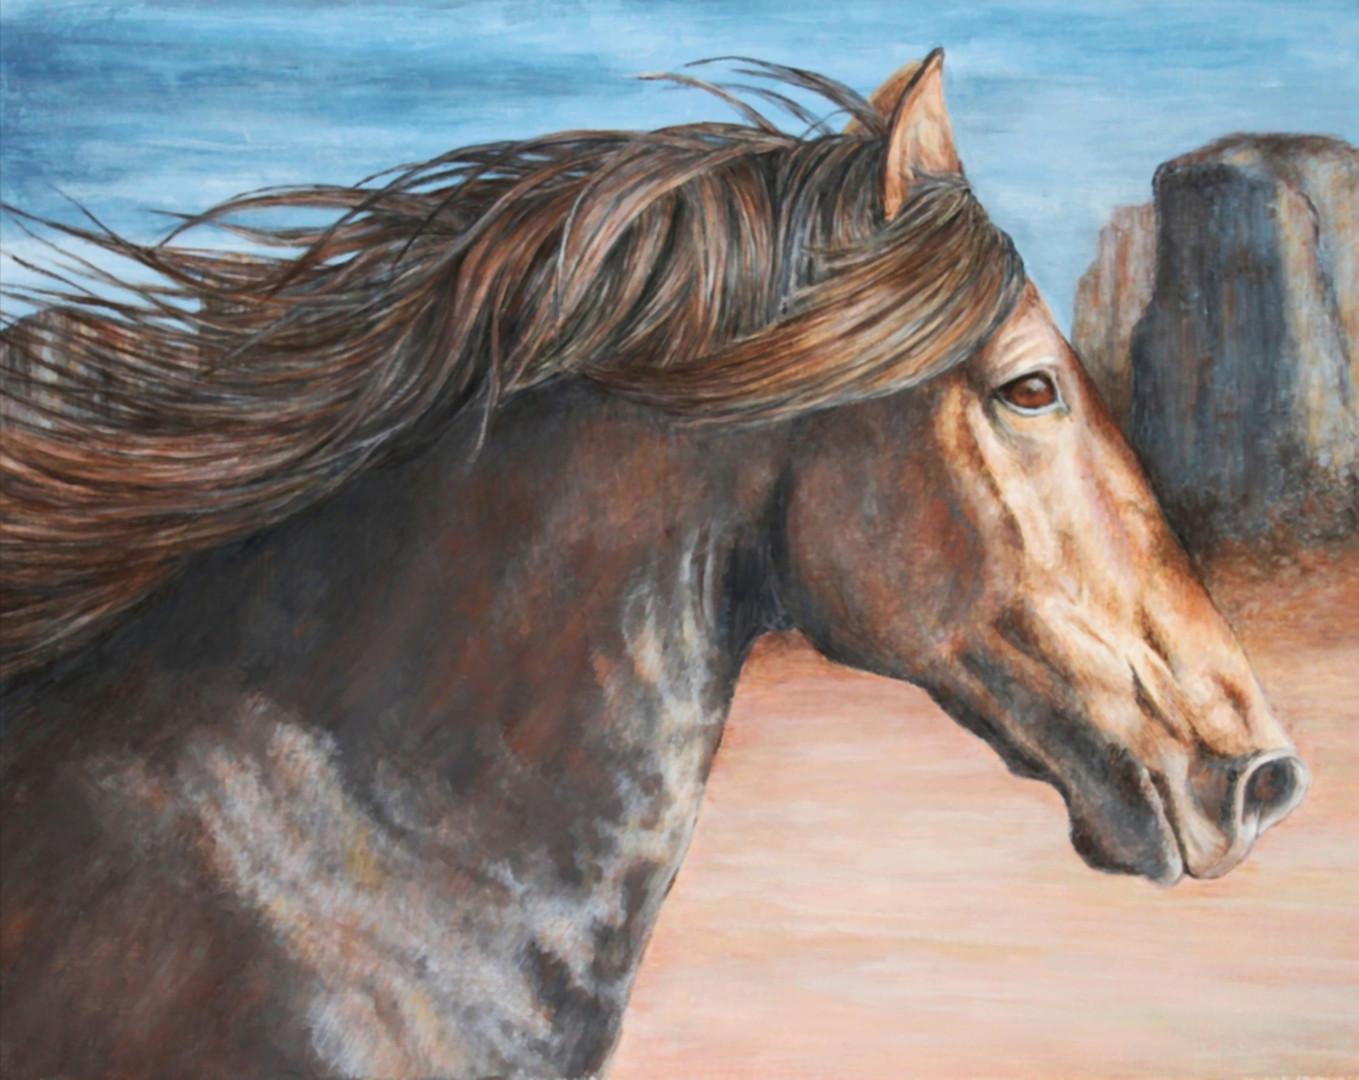 w-horse-001.JPG